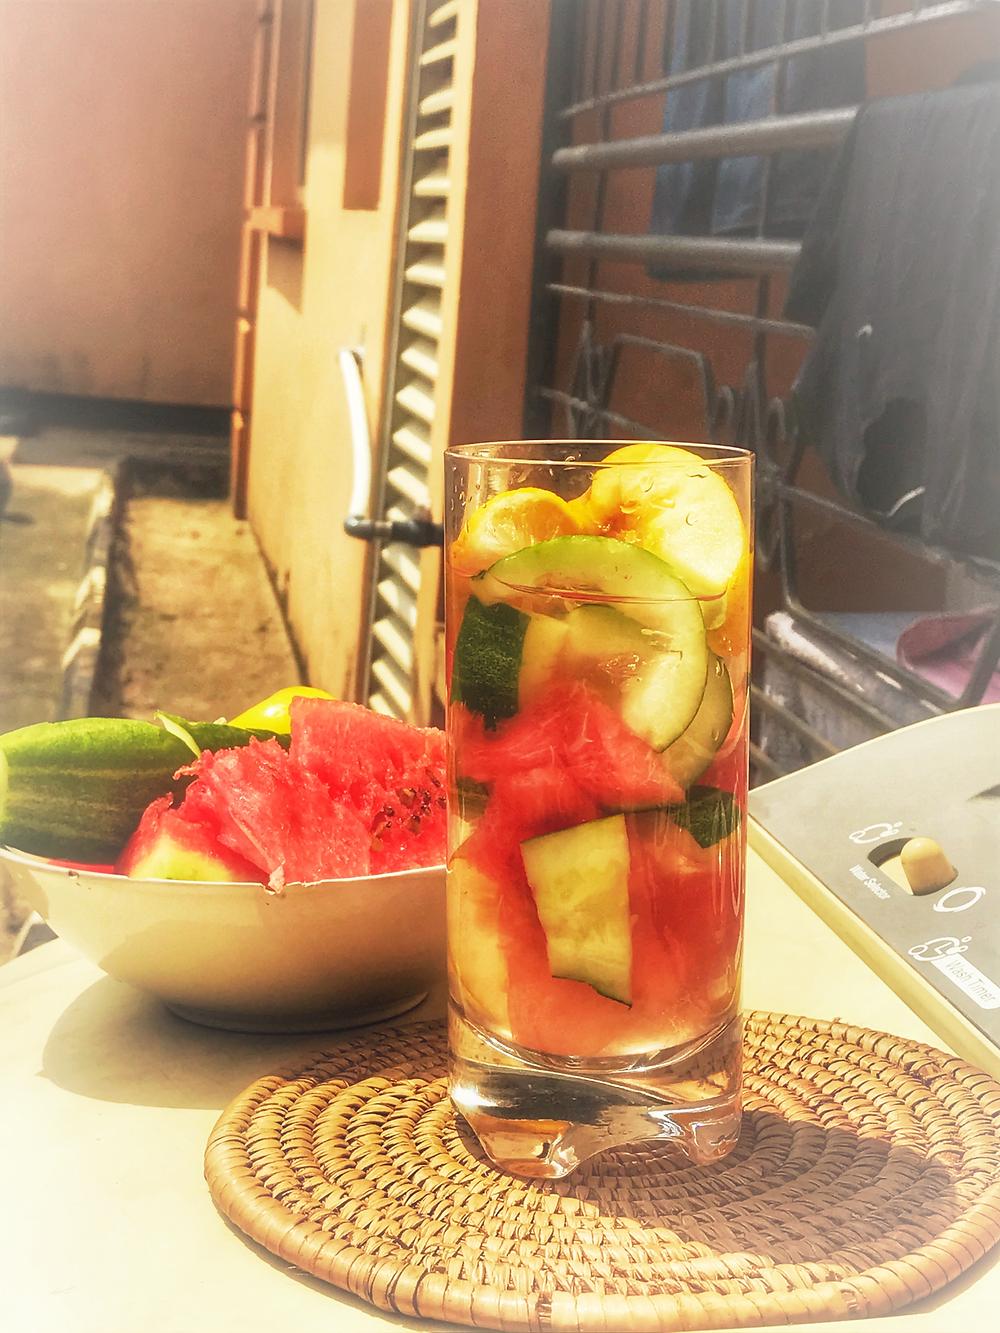 fruits comprise of apple,lemon,cucumber, waterlemon,pineapple.